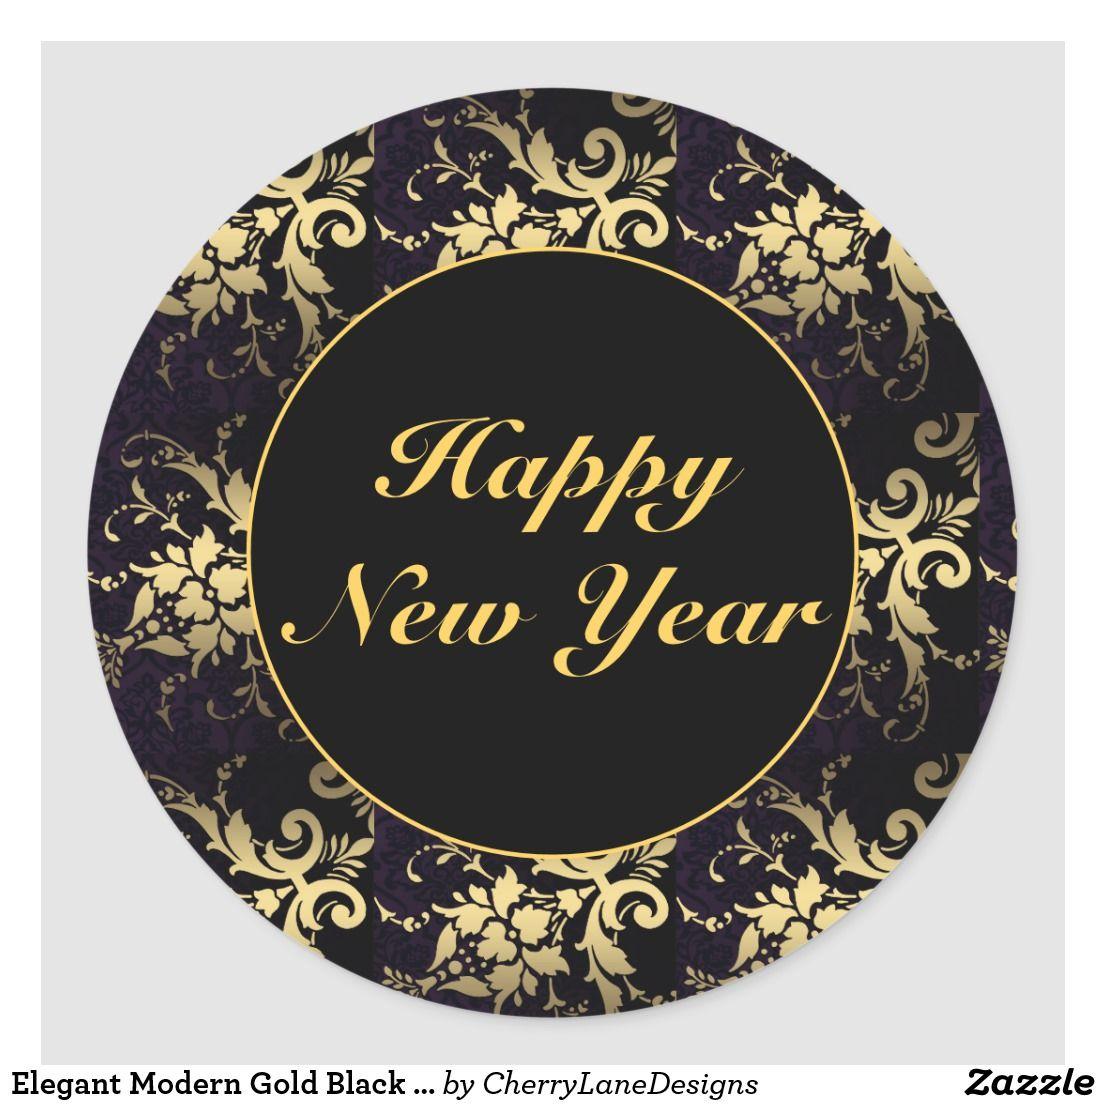 Elegant Modern Gold Black Happy New Year Stickers Zazzle Com In 2021 Happy New Year Stickers Happy New Year Images New Year Stickers